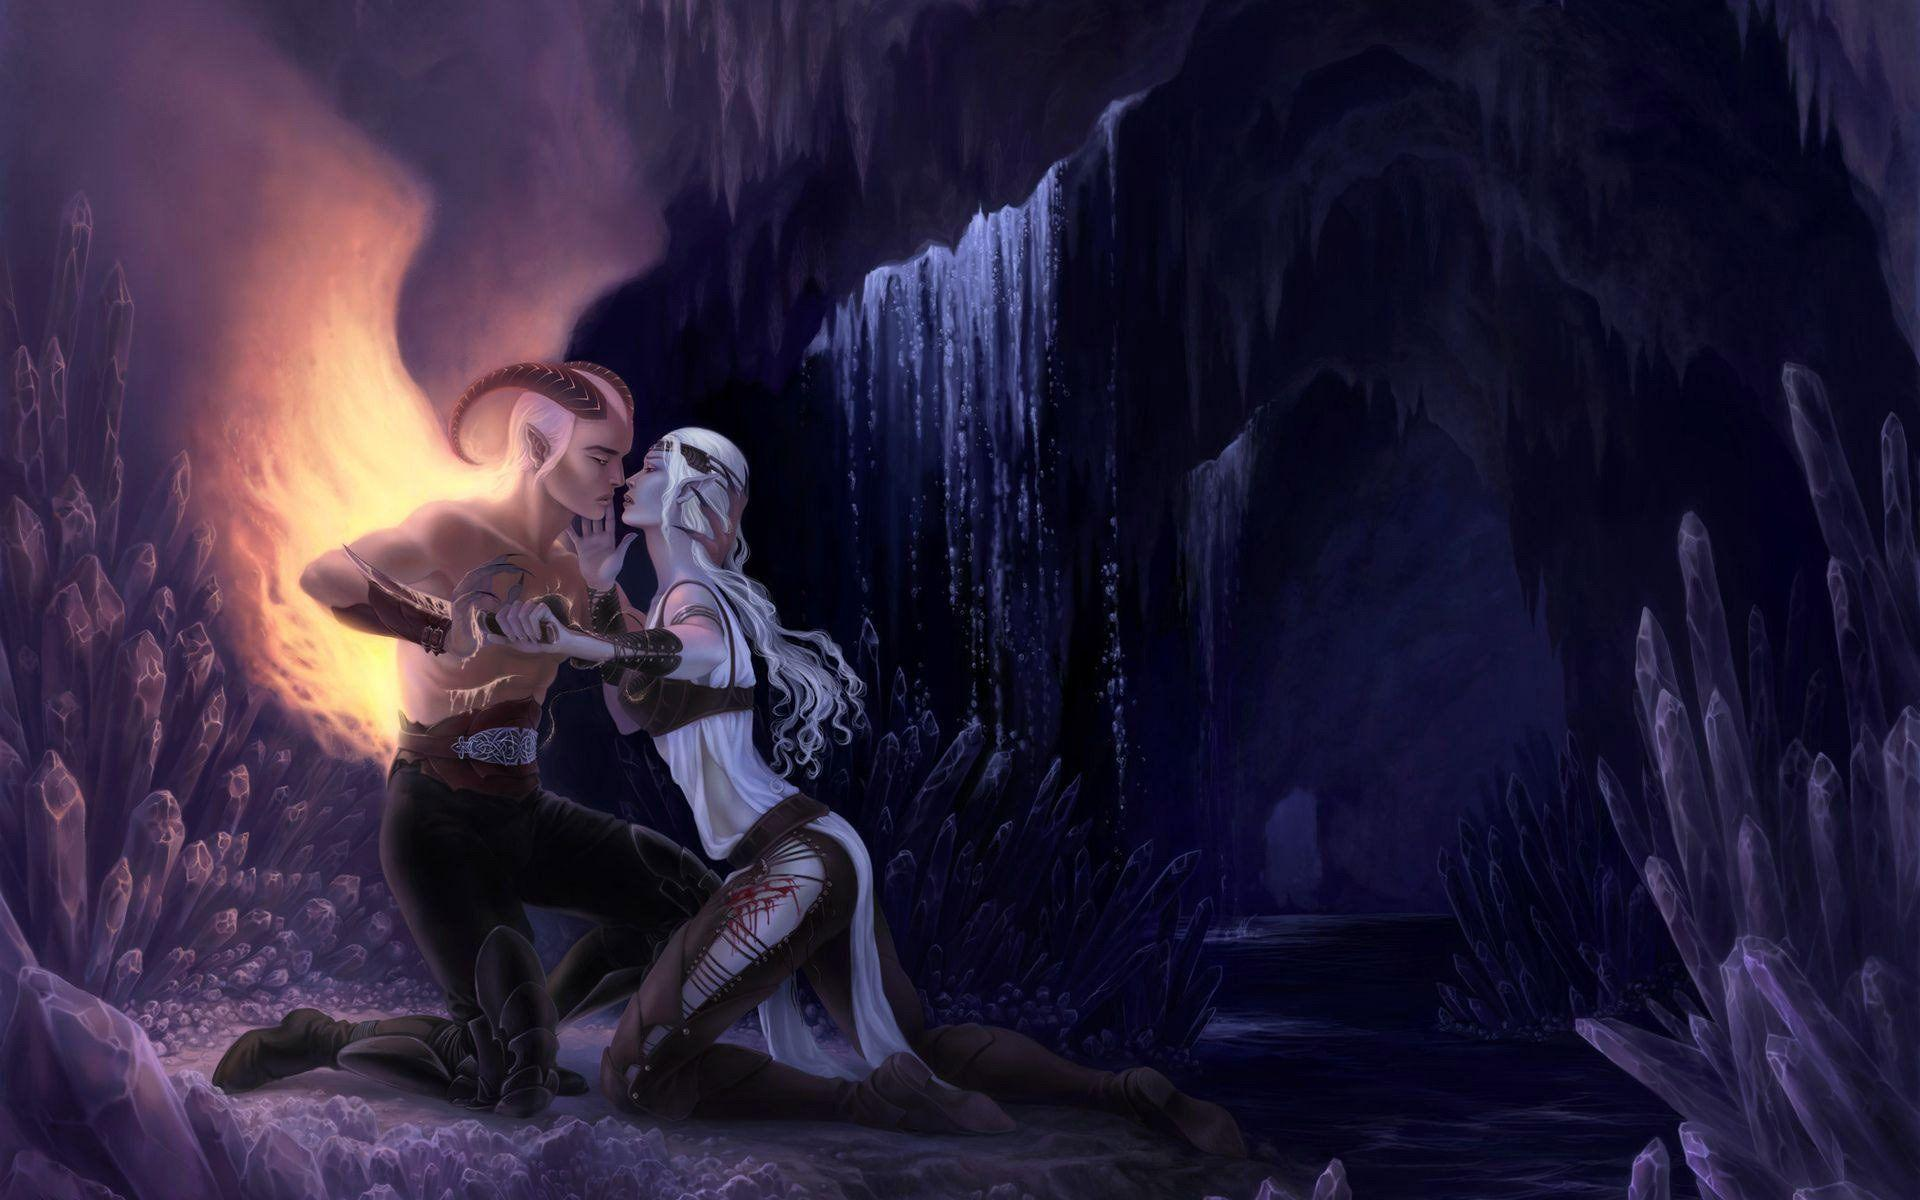 Cute Hugging Couples Wallpapers Dark Love Wallpapers Wallpaper Cave